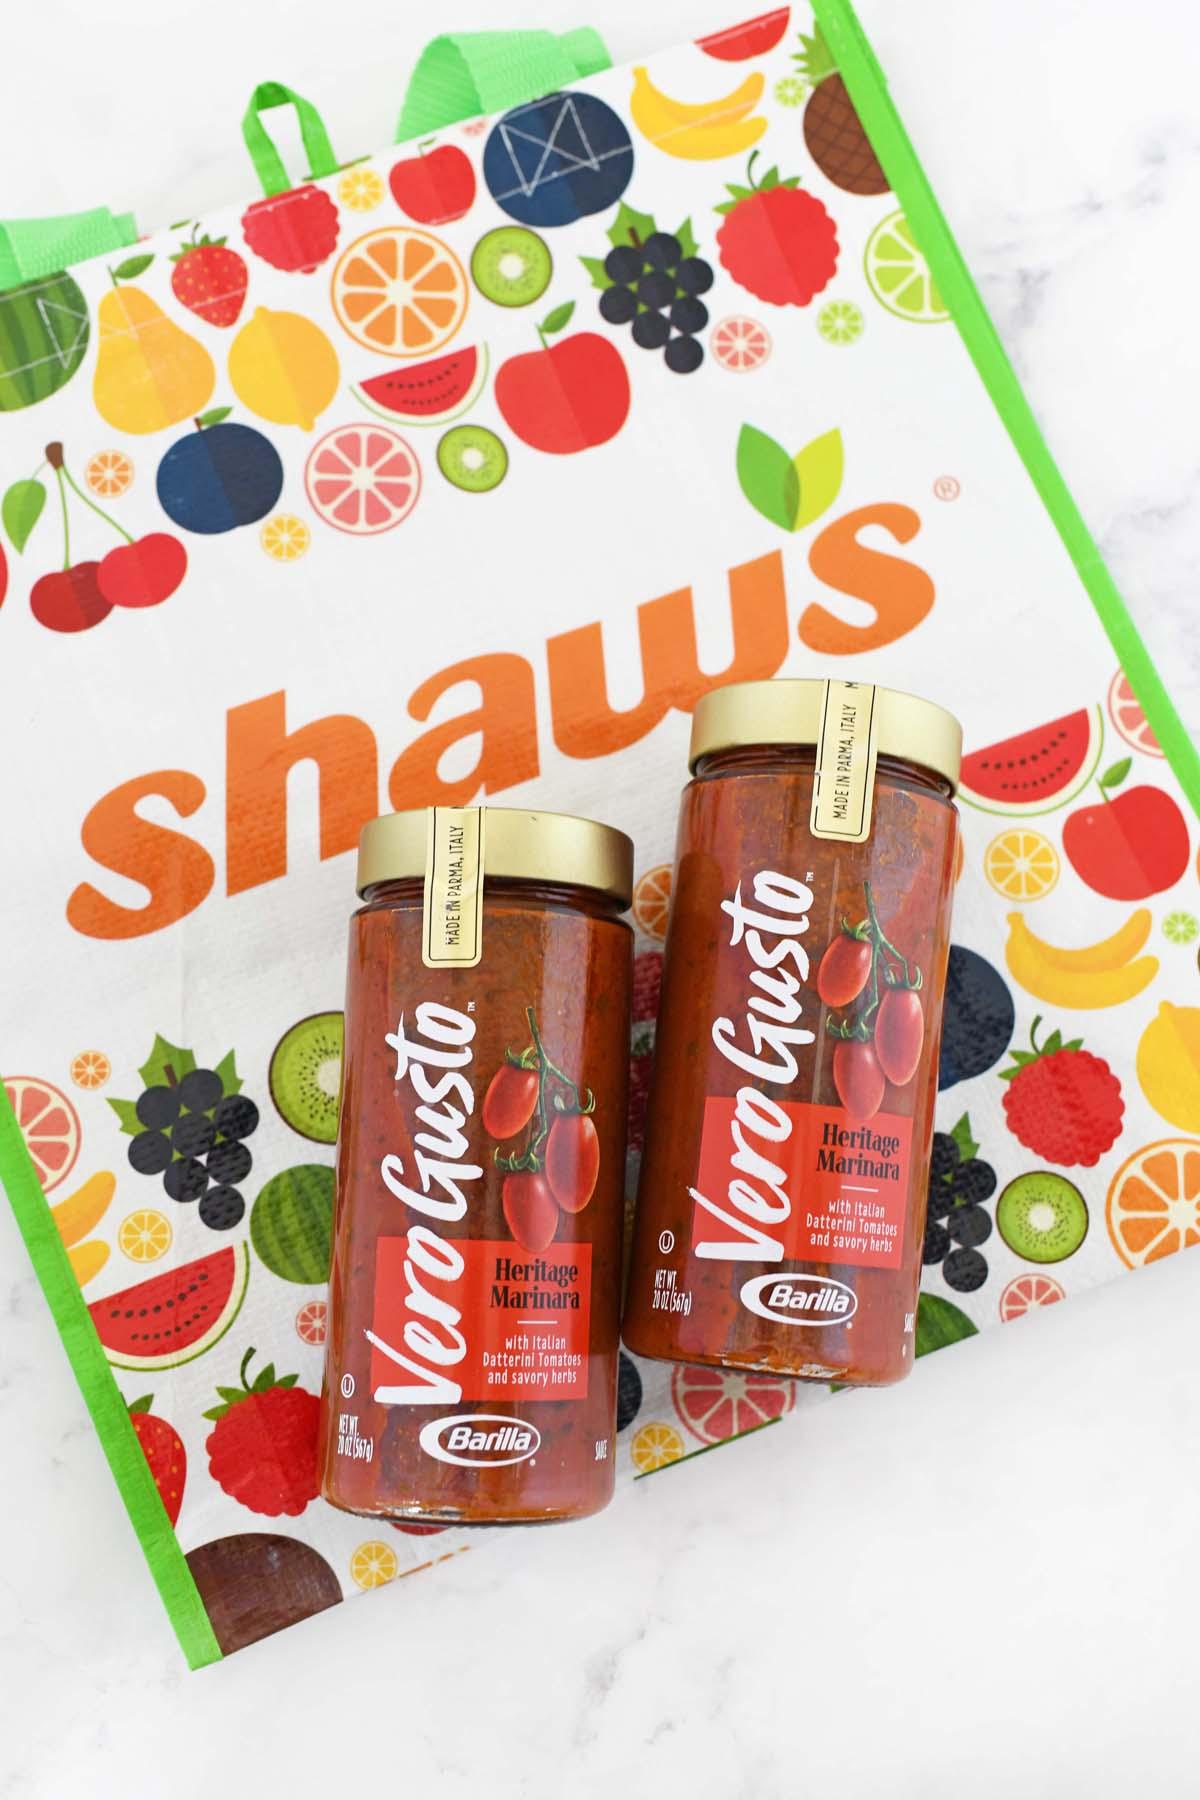 Vero Gusto Marinara Sauce on a colorful Shaw's bag.